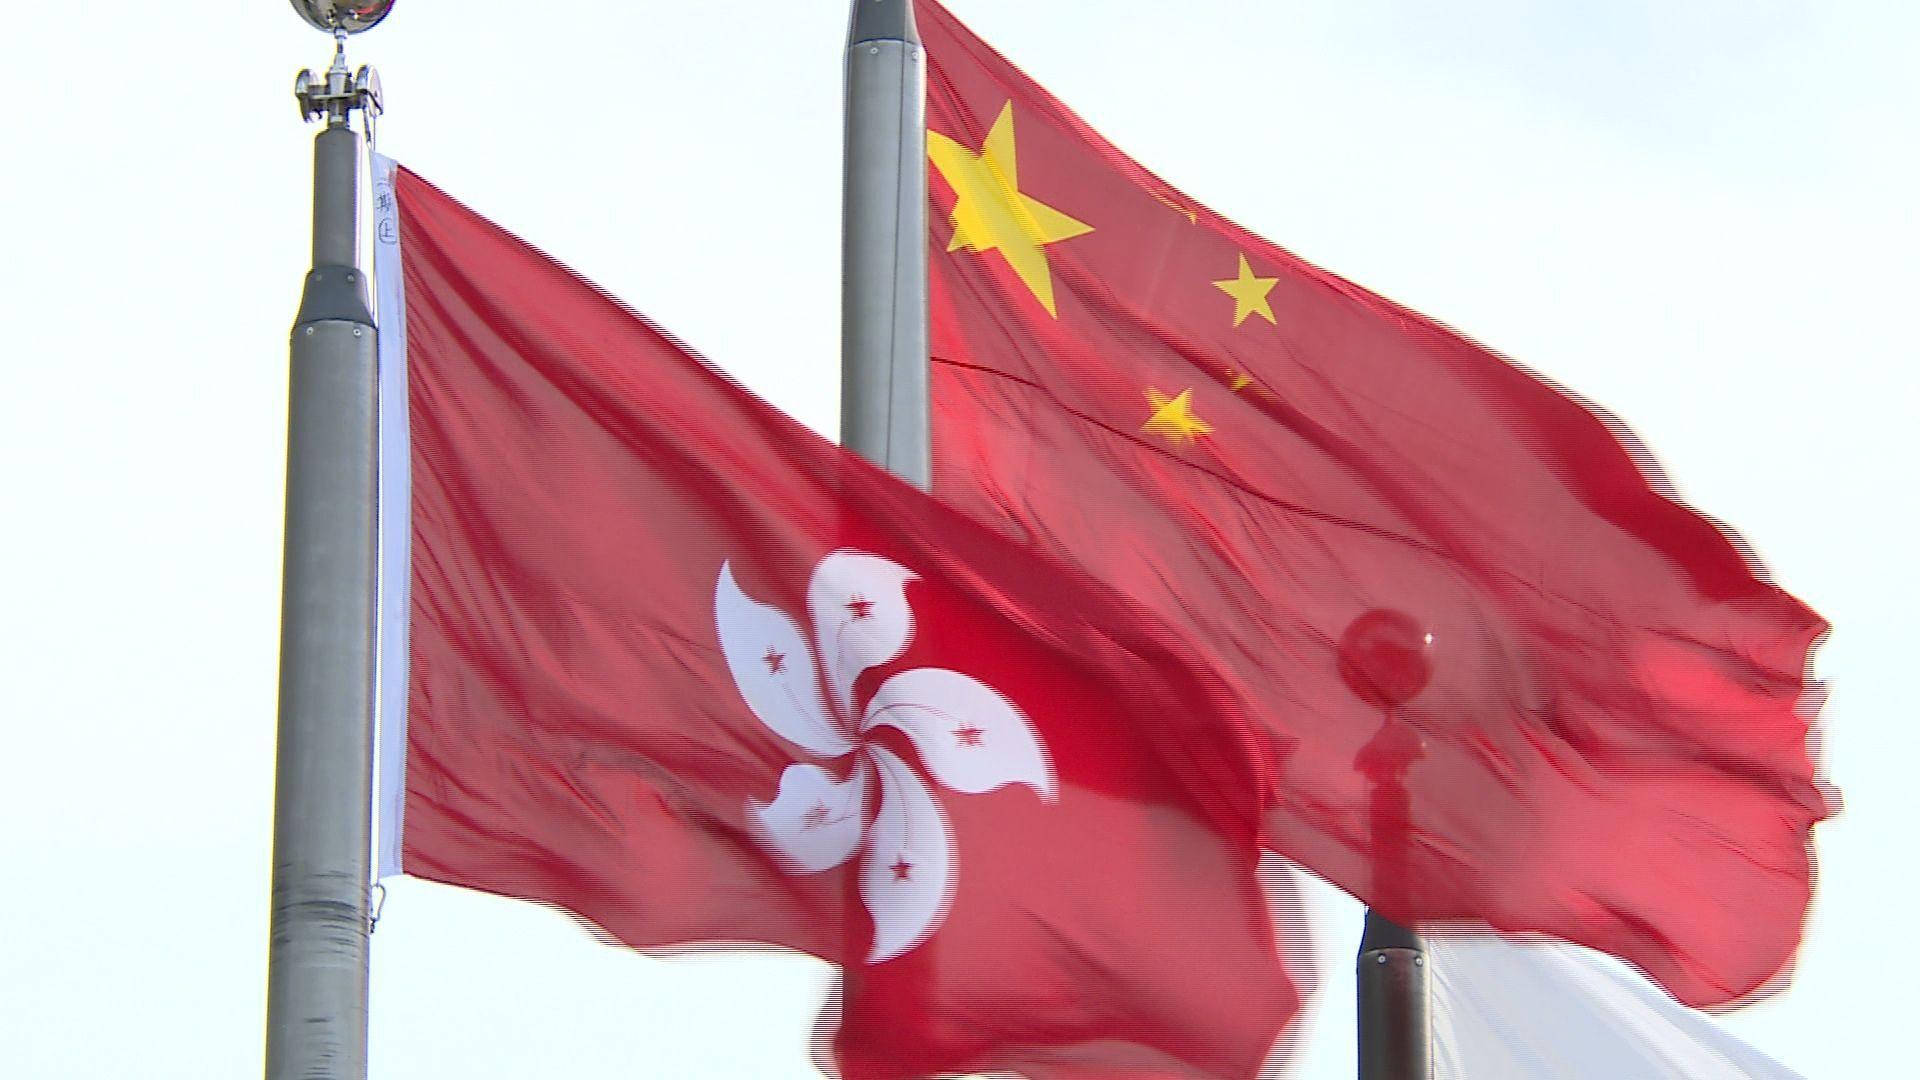 Banderas de Hong Kong y China - Sputnik Mundo, 1920, 30.03.2021